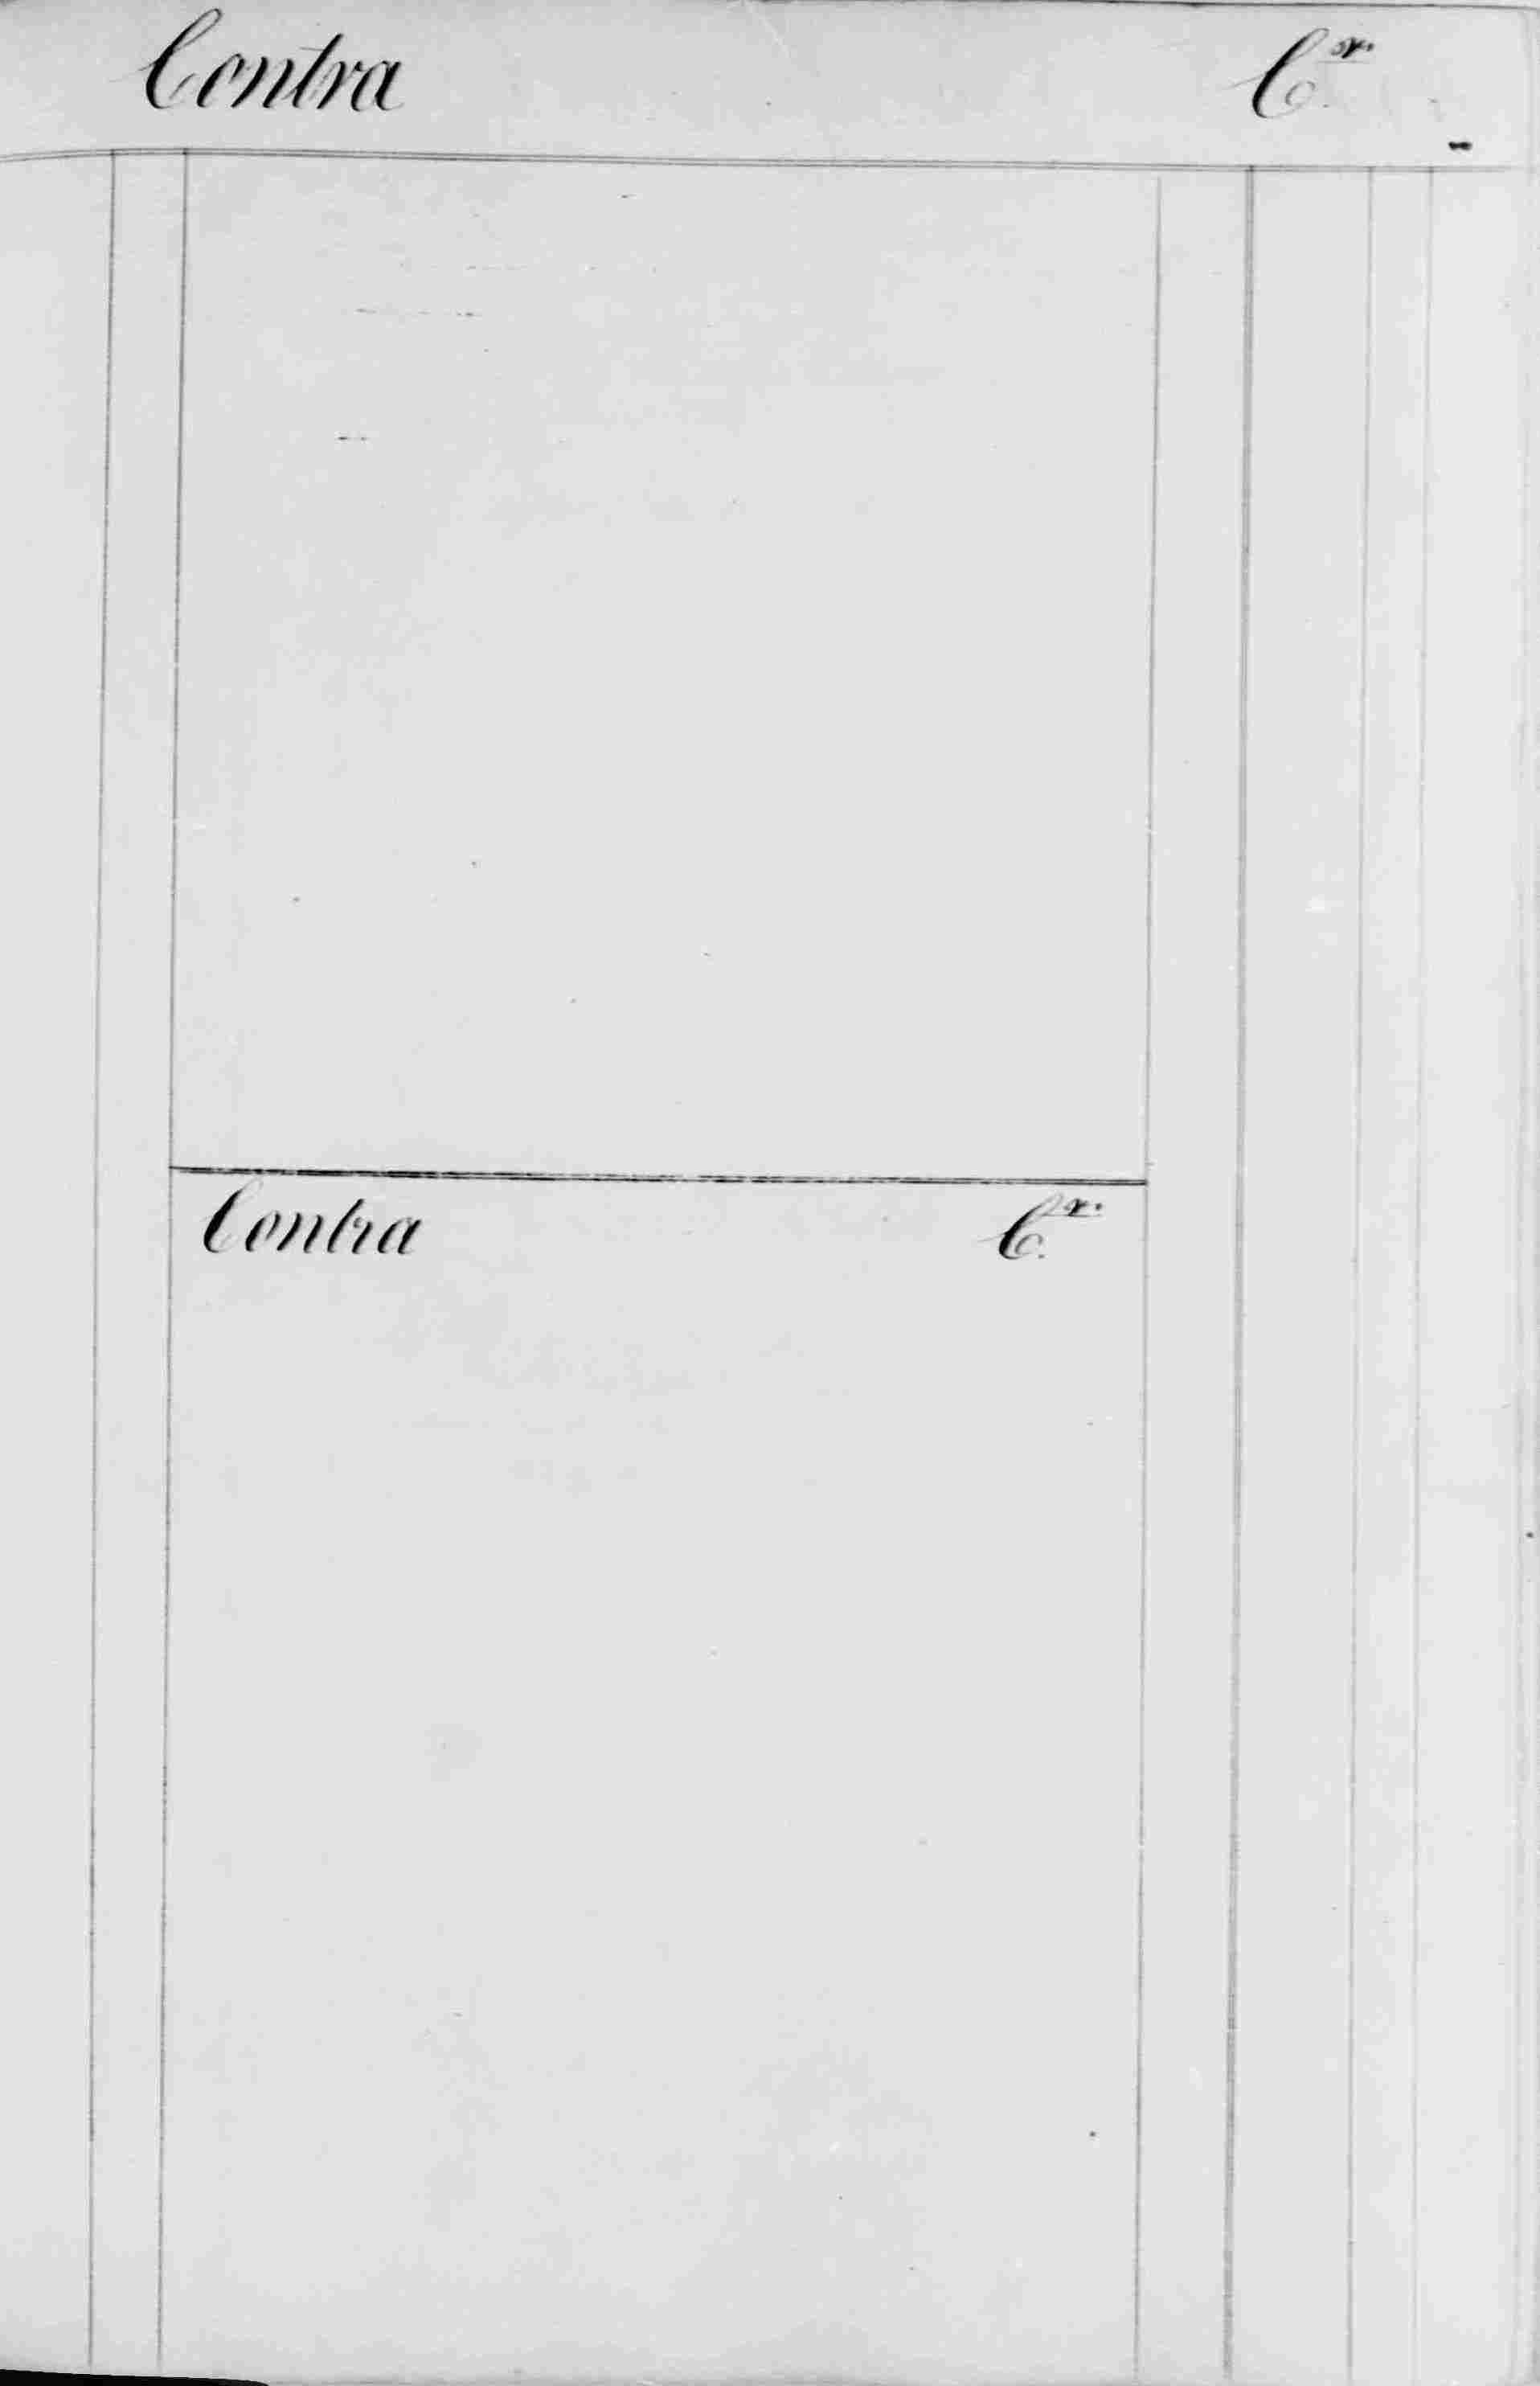 Ledger B, folio 291, right side